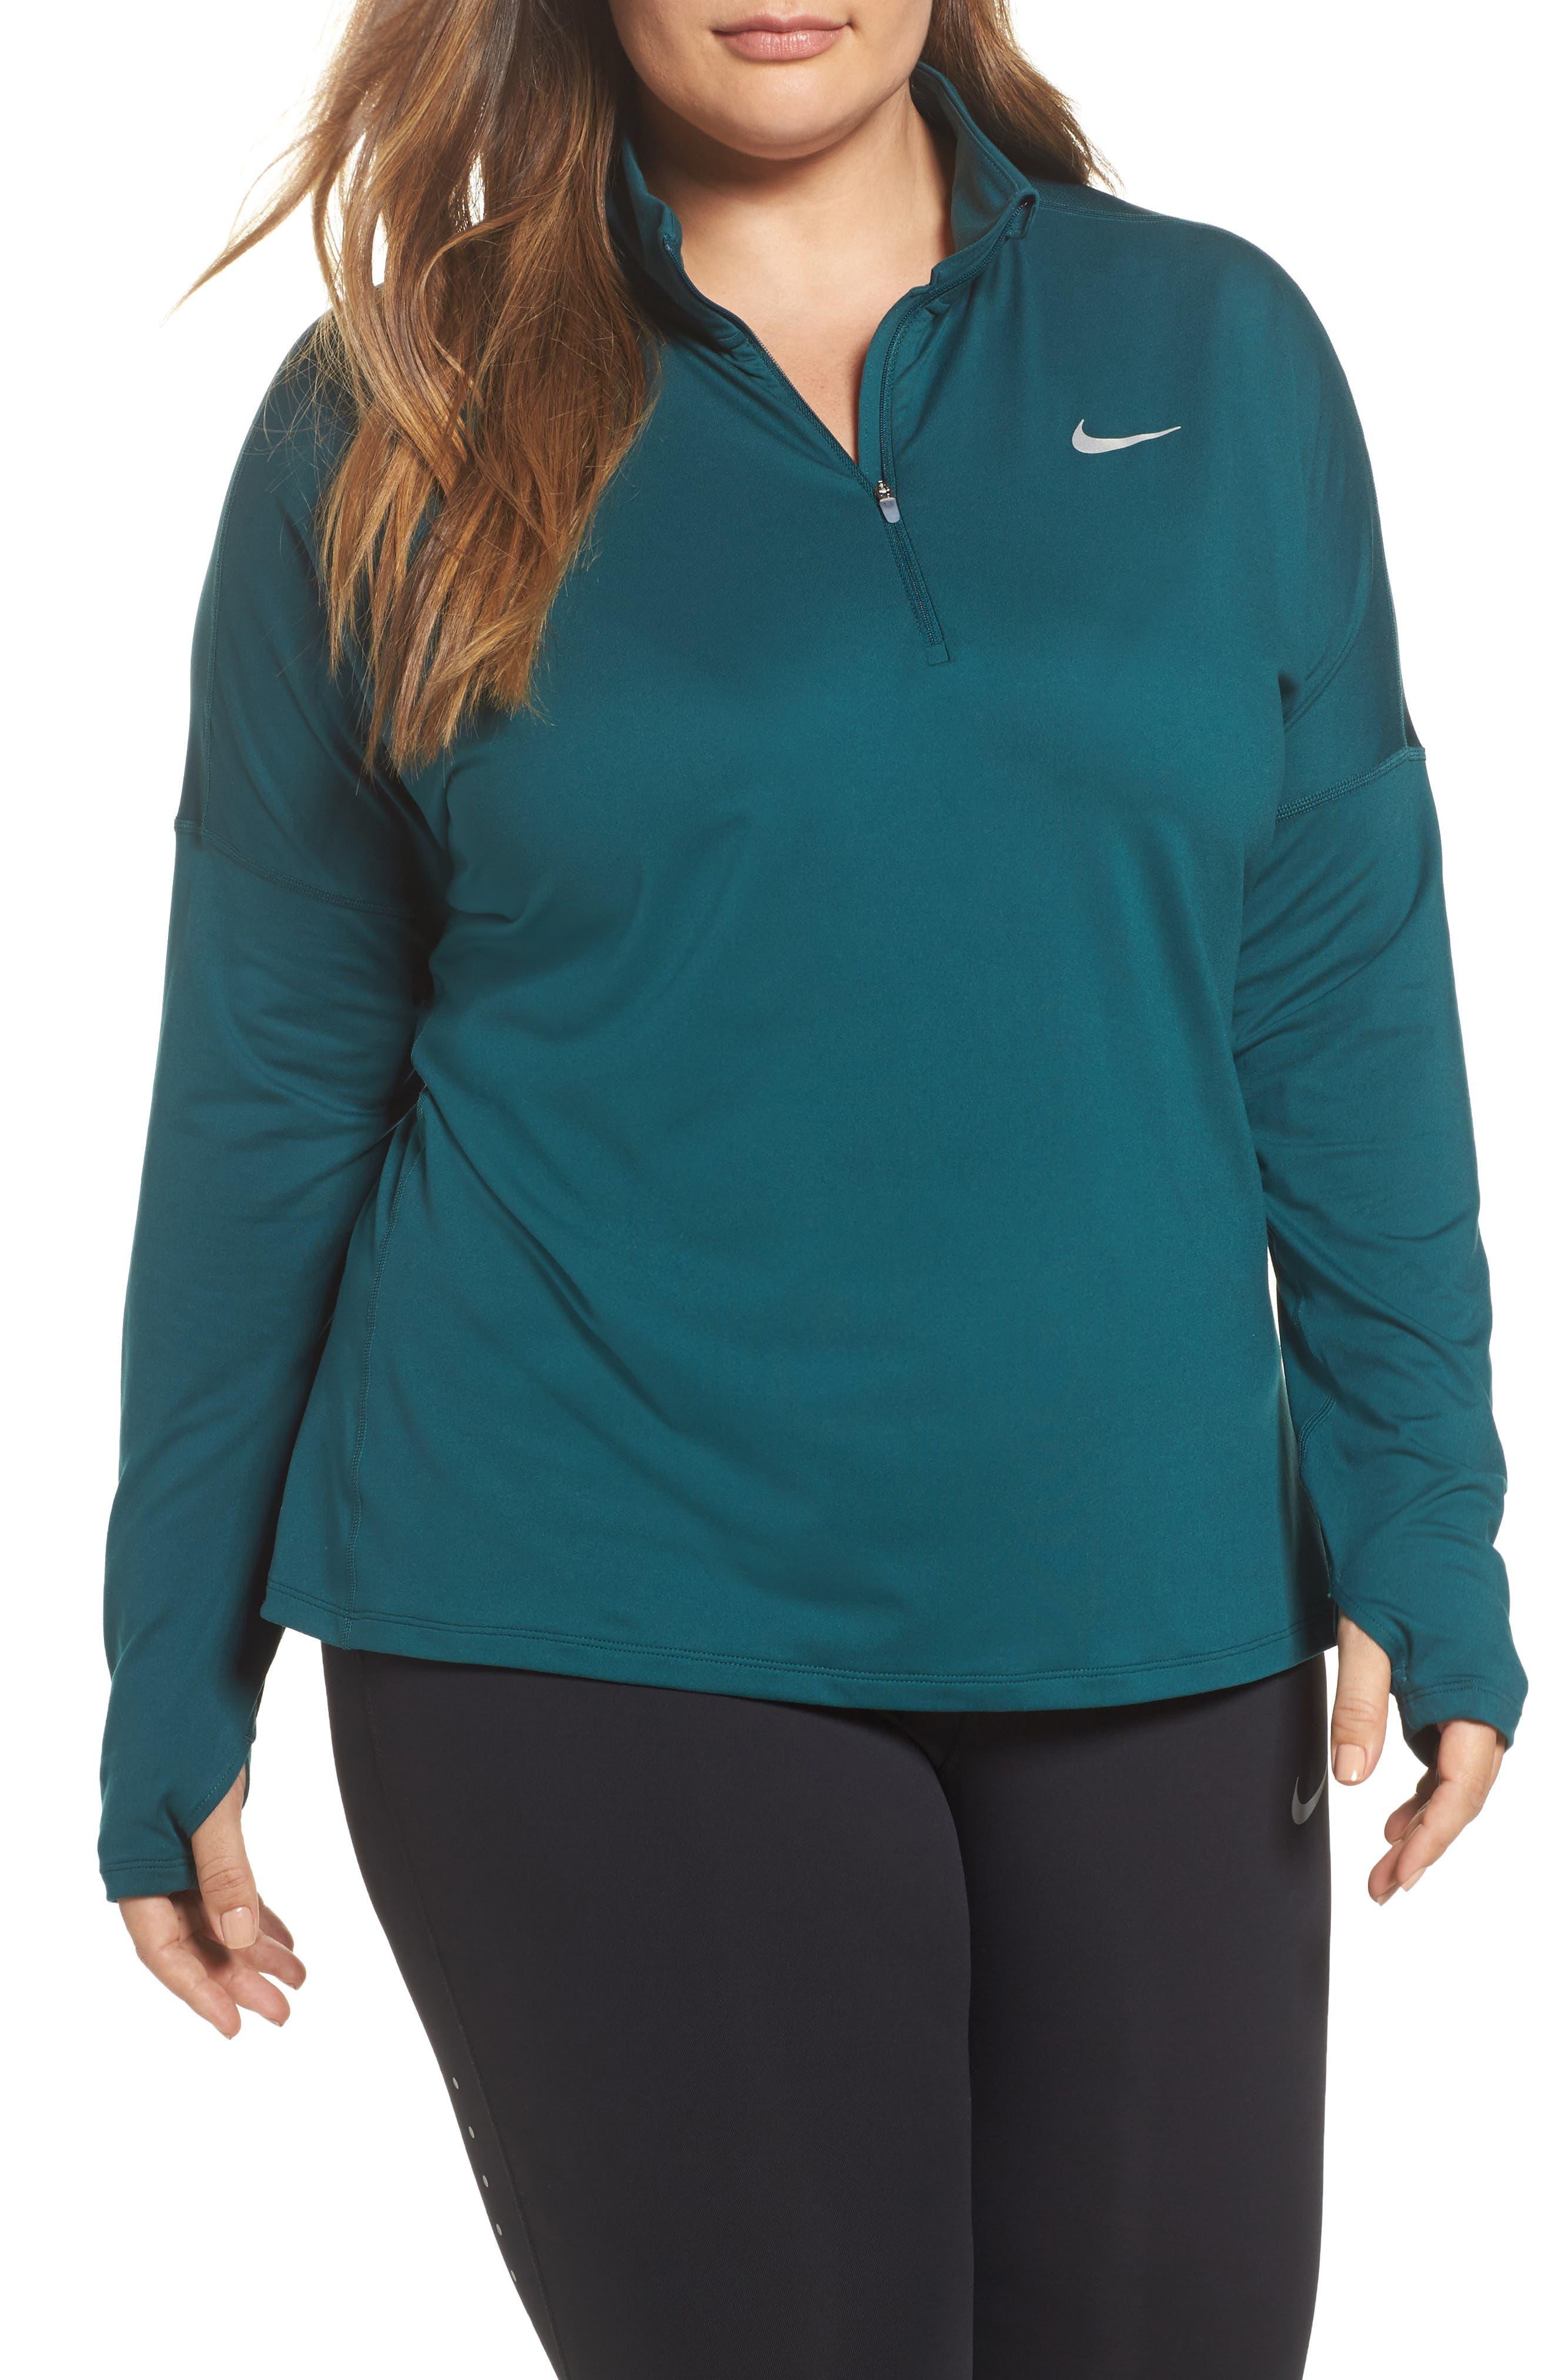 Nike Dry Element Half Zip Top (Plus Size)